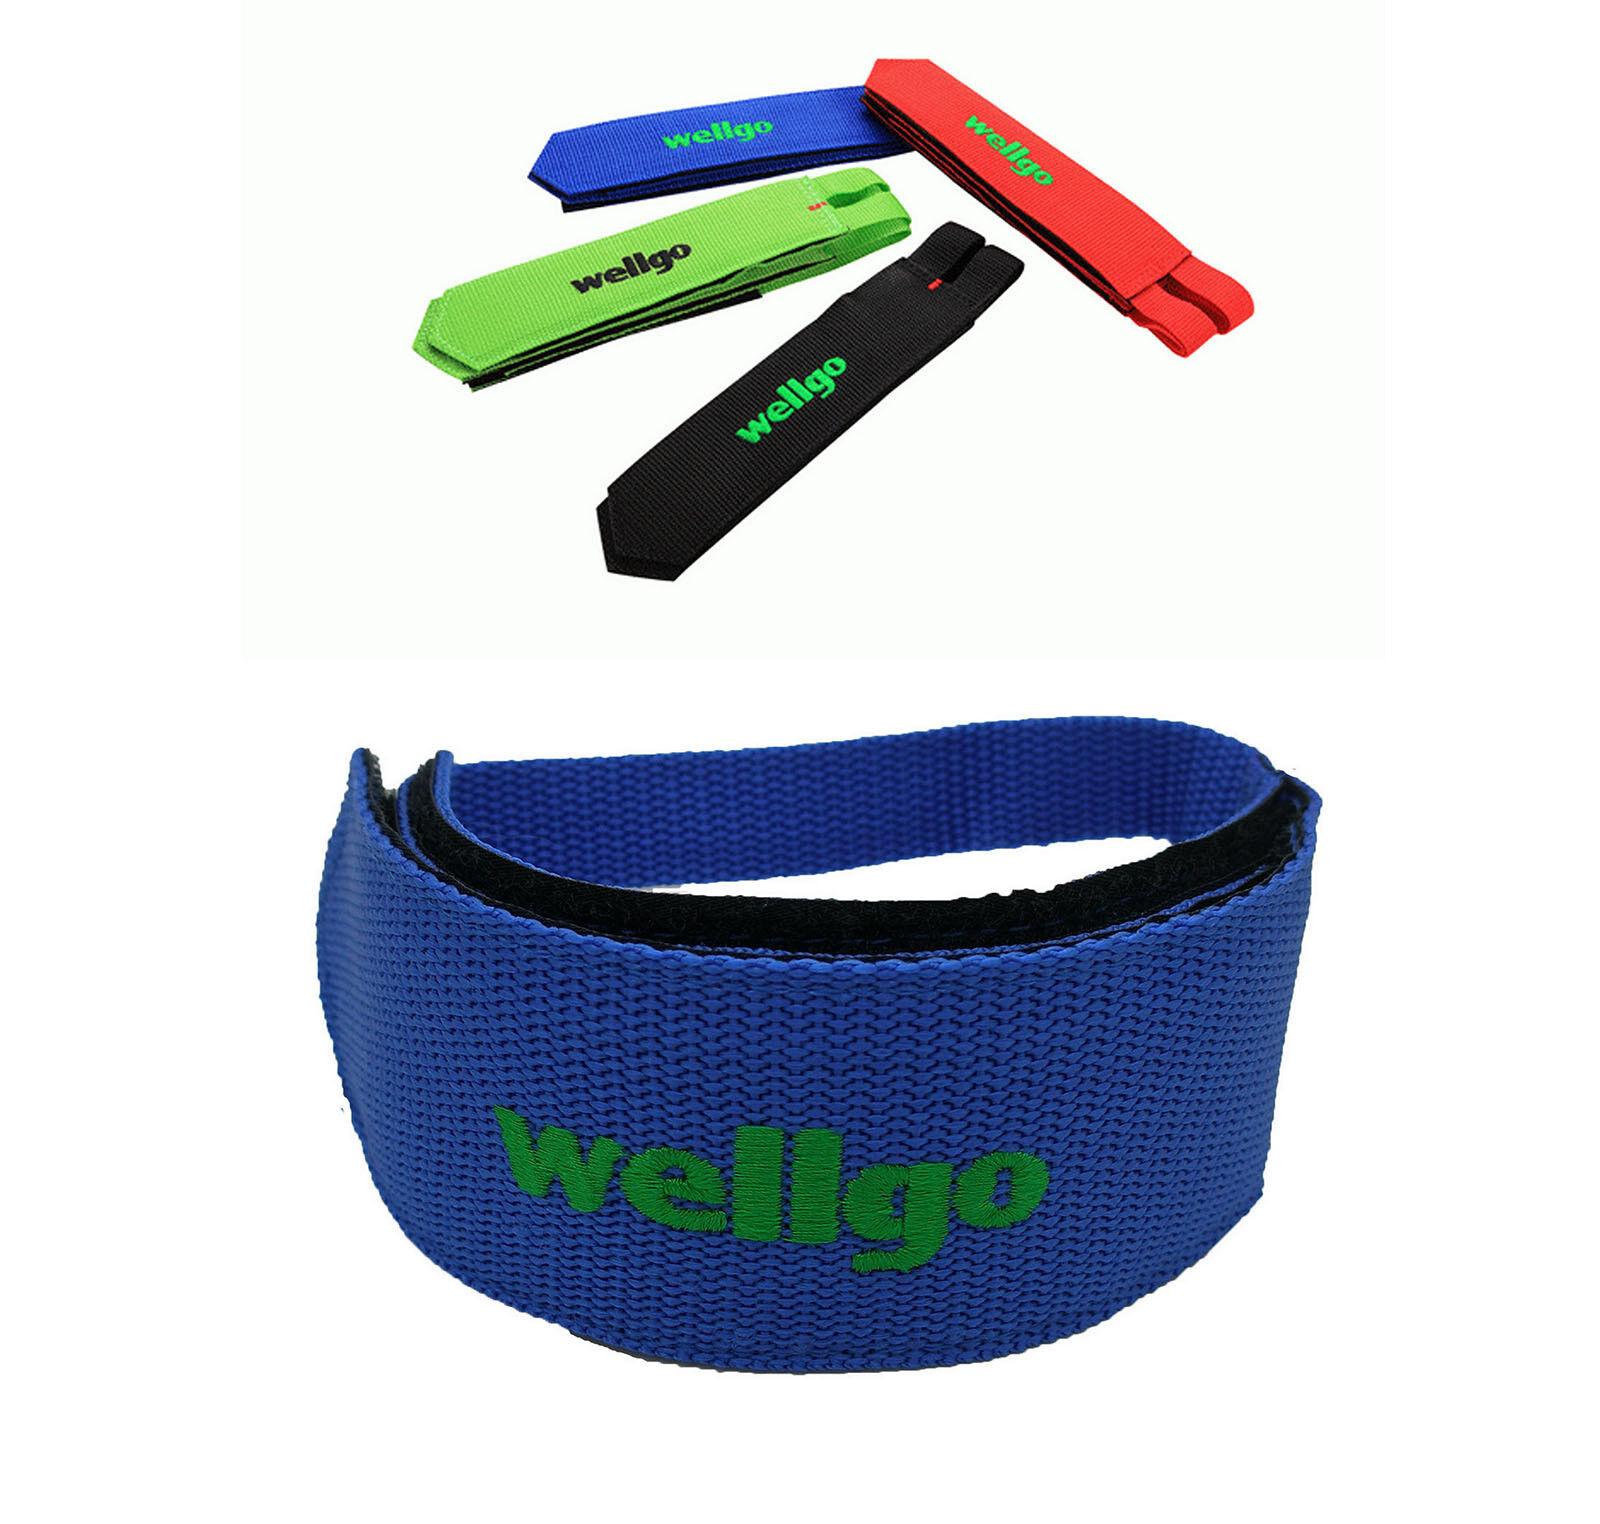 2x Straps Correas de Nylon de WELLGO para Pedales Pedales Pedales de Bicicleta Fixie Azul 3211a 270629